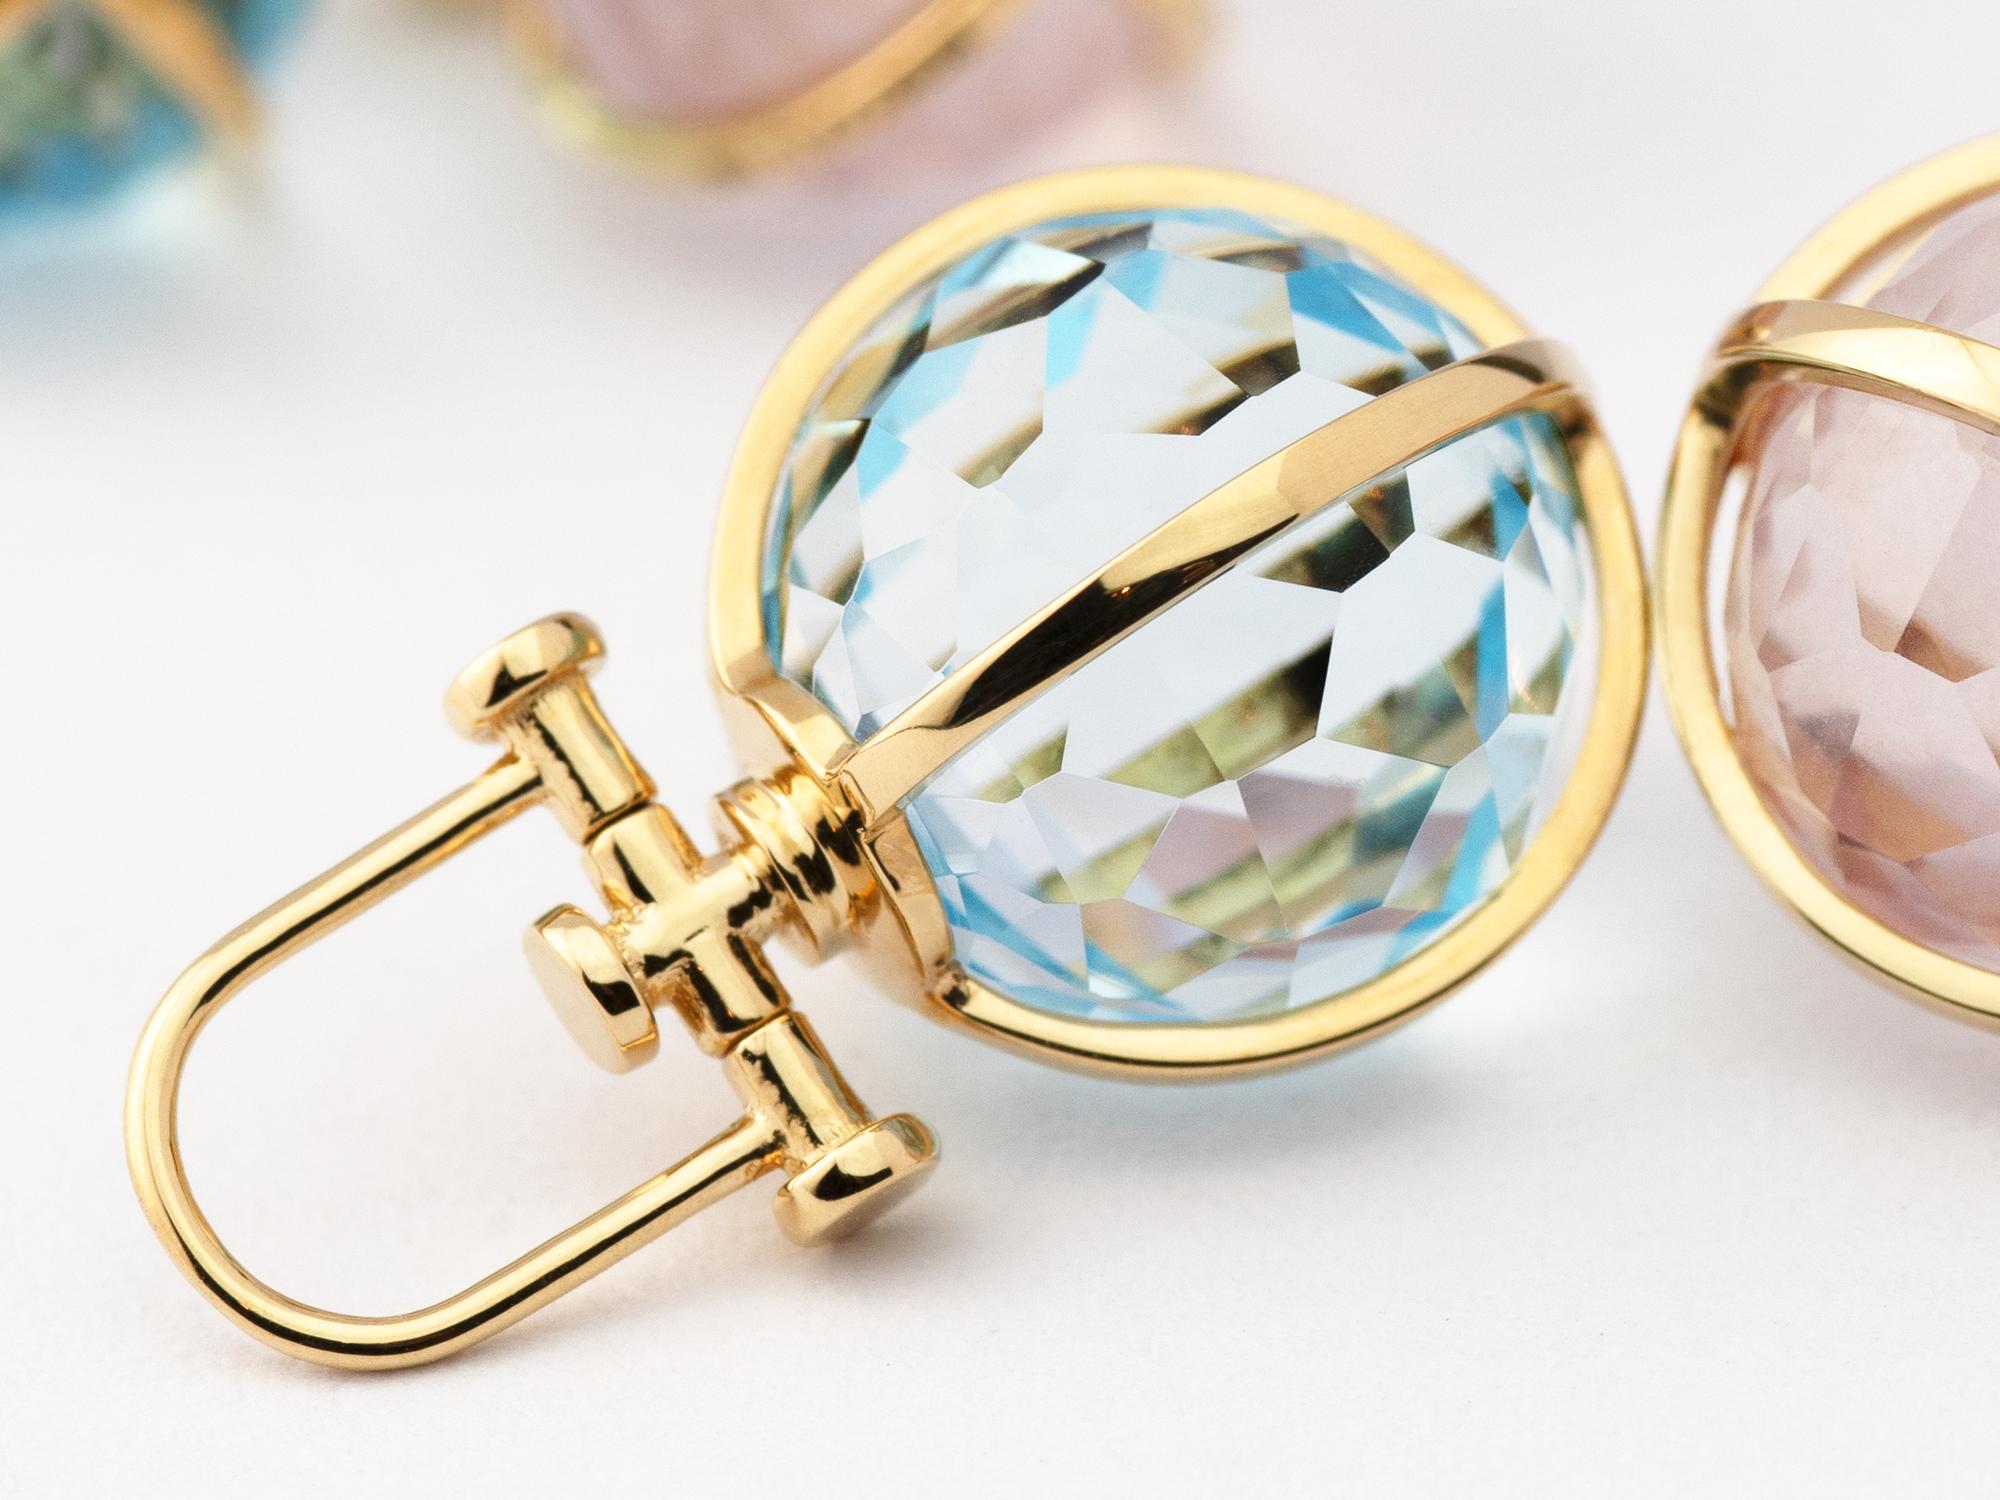 Rebecca Li Medium Crystal Orb Talisman Pendant, 18k Solid Yellow Gold, Natural Blue Topaz